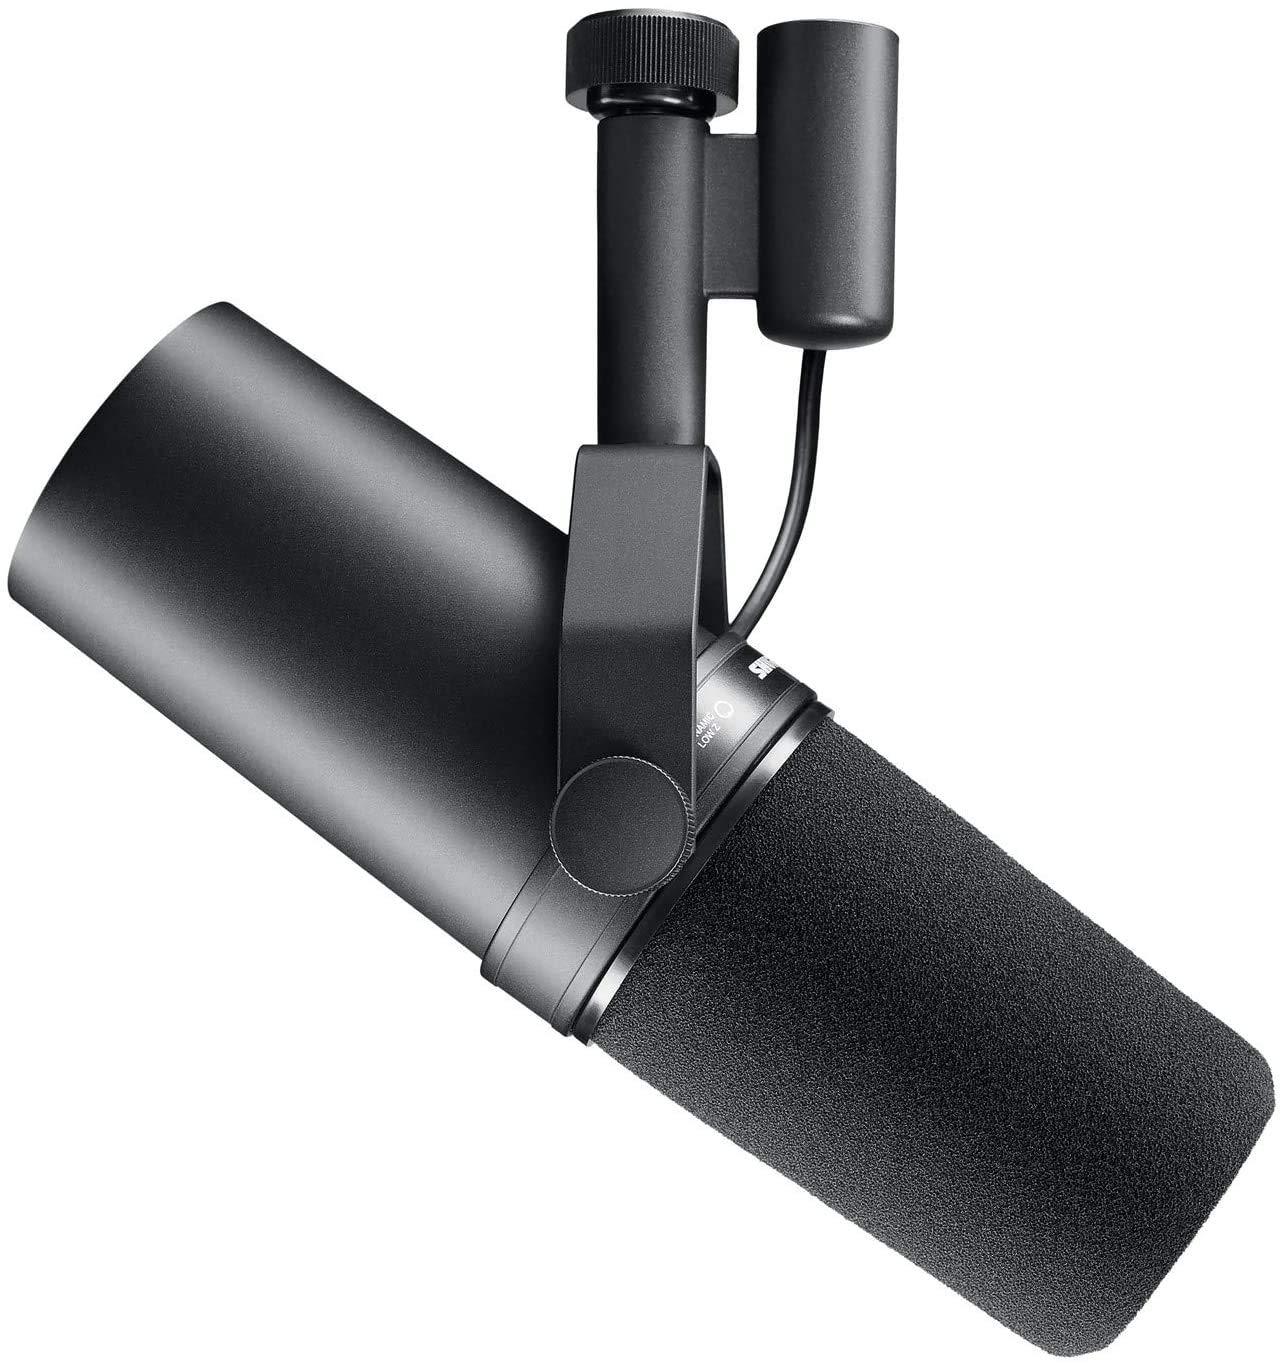 Shure SM7B microphone